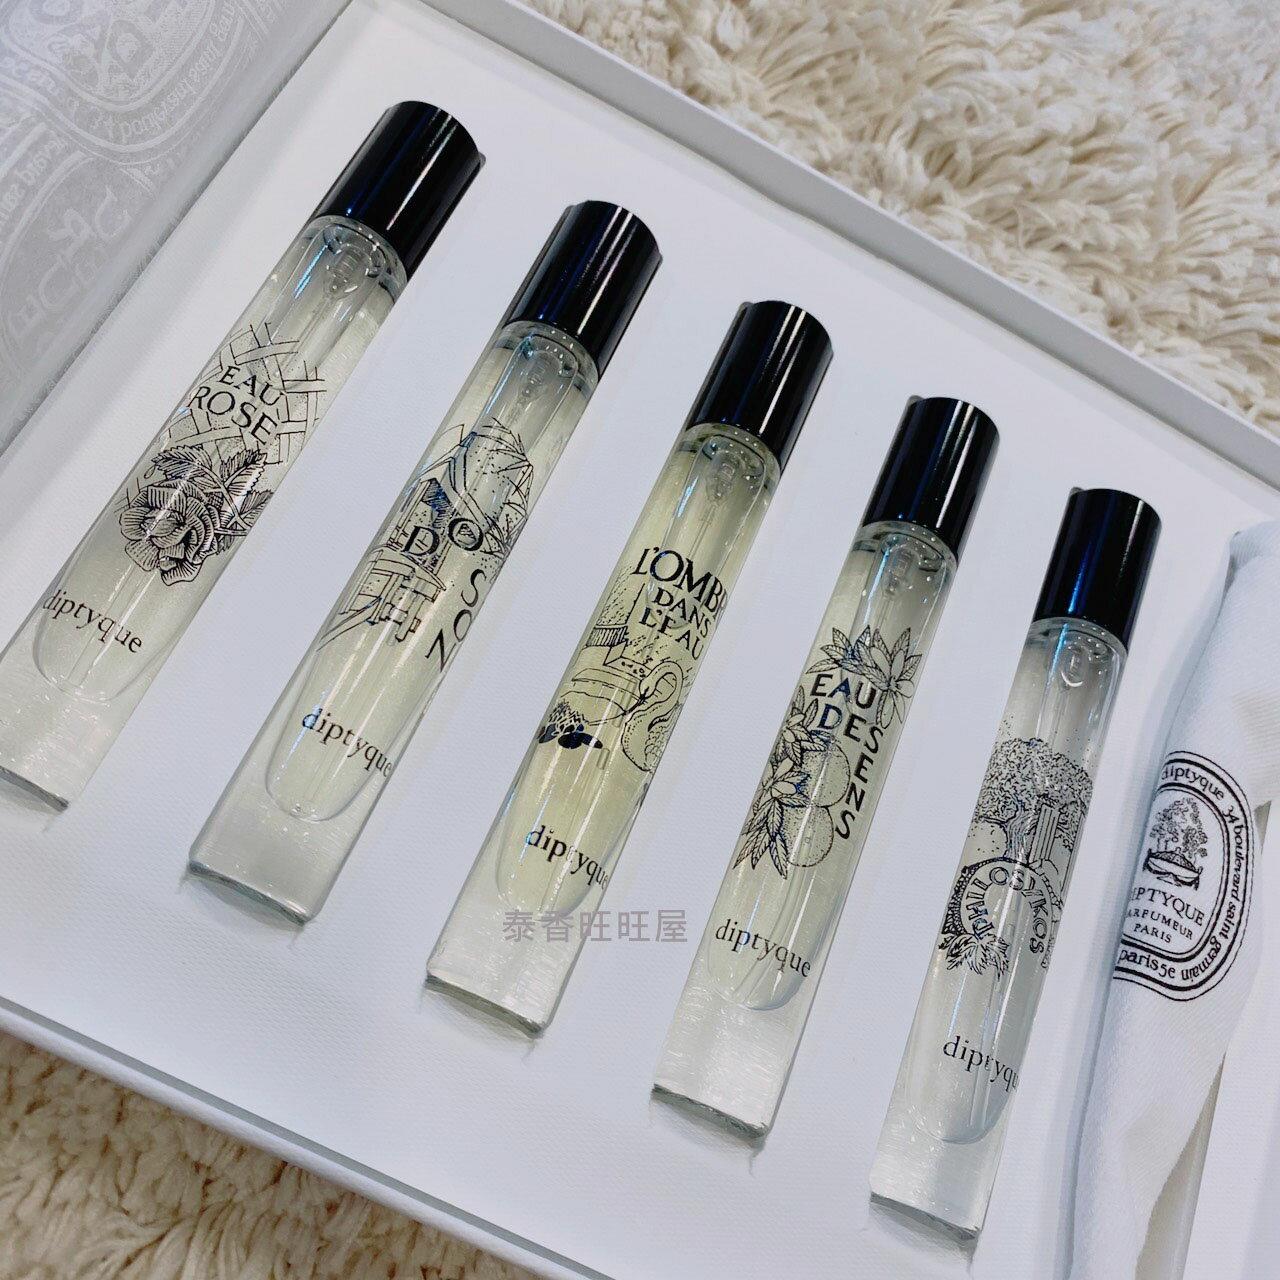 【Diptyque】經典淡香水禮盒/7.5ml/玫瑰之水/杜桑/感官/影中/無花果/情人節禮物